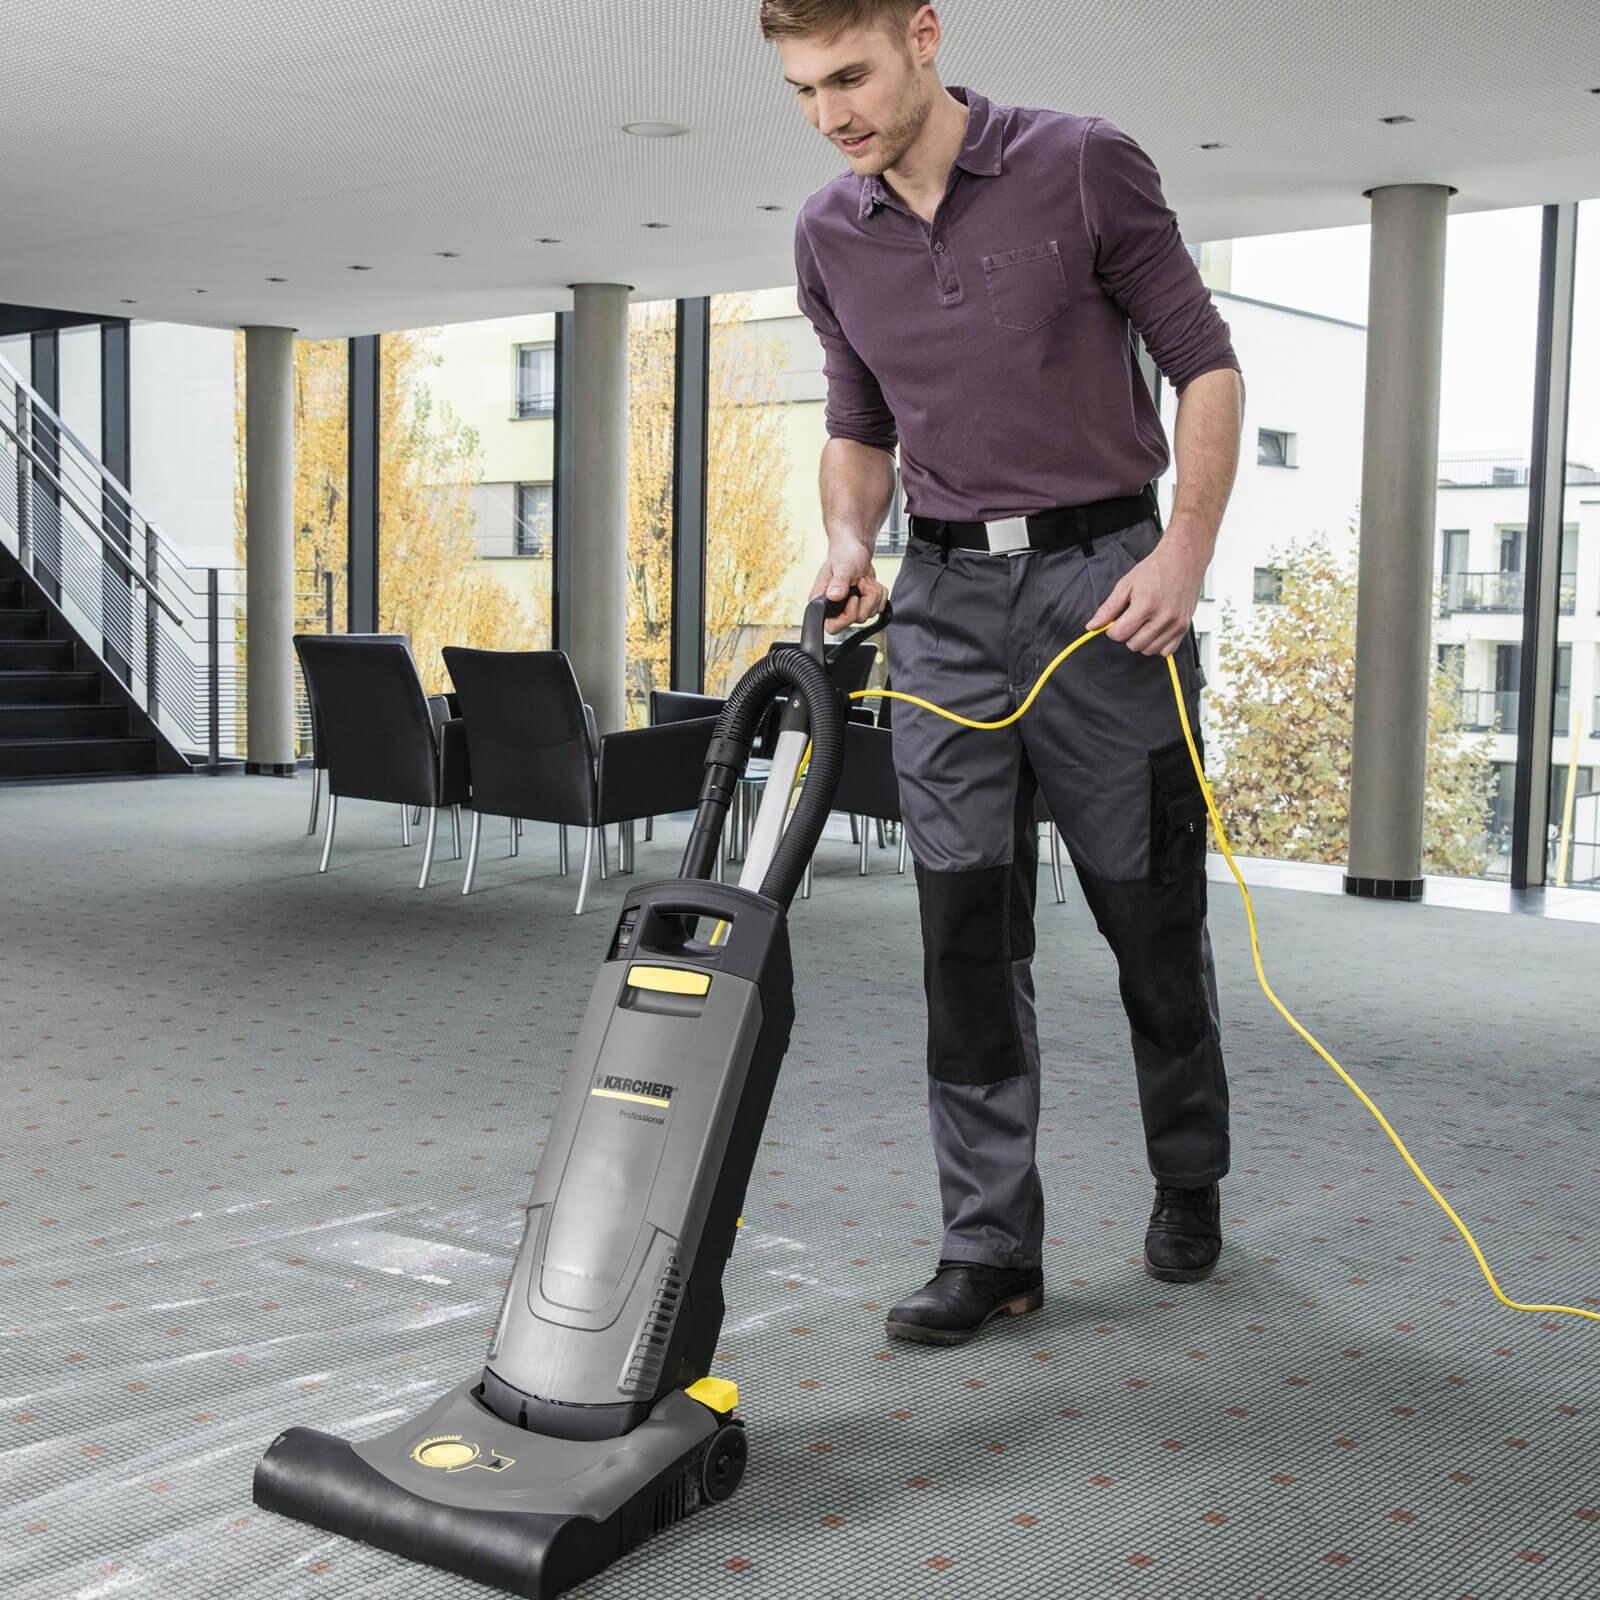 d1b2051fdb6 Karcher CV 38 2 ADV Professional Upright Vacuum Cleaner